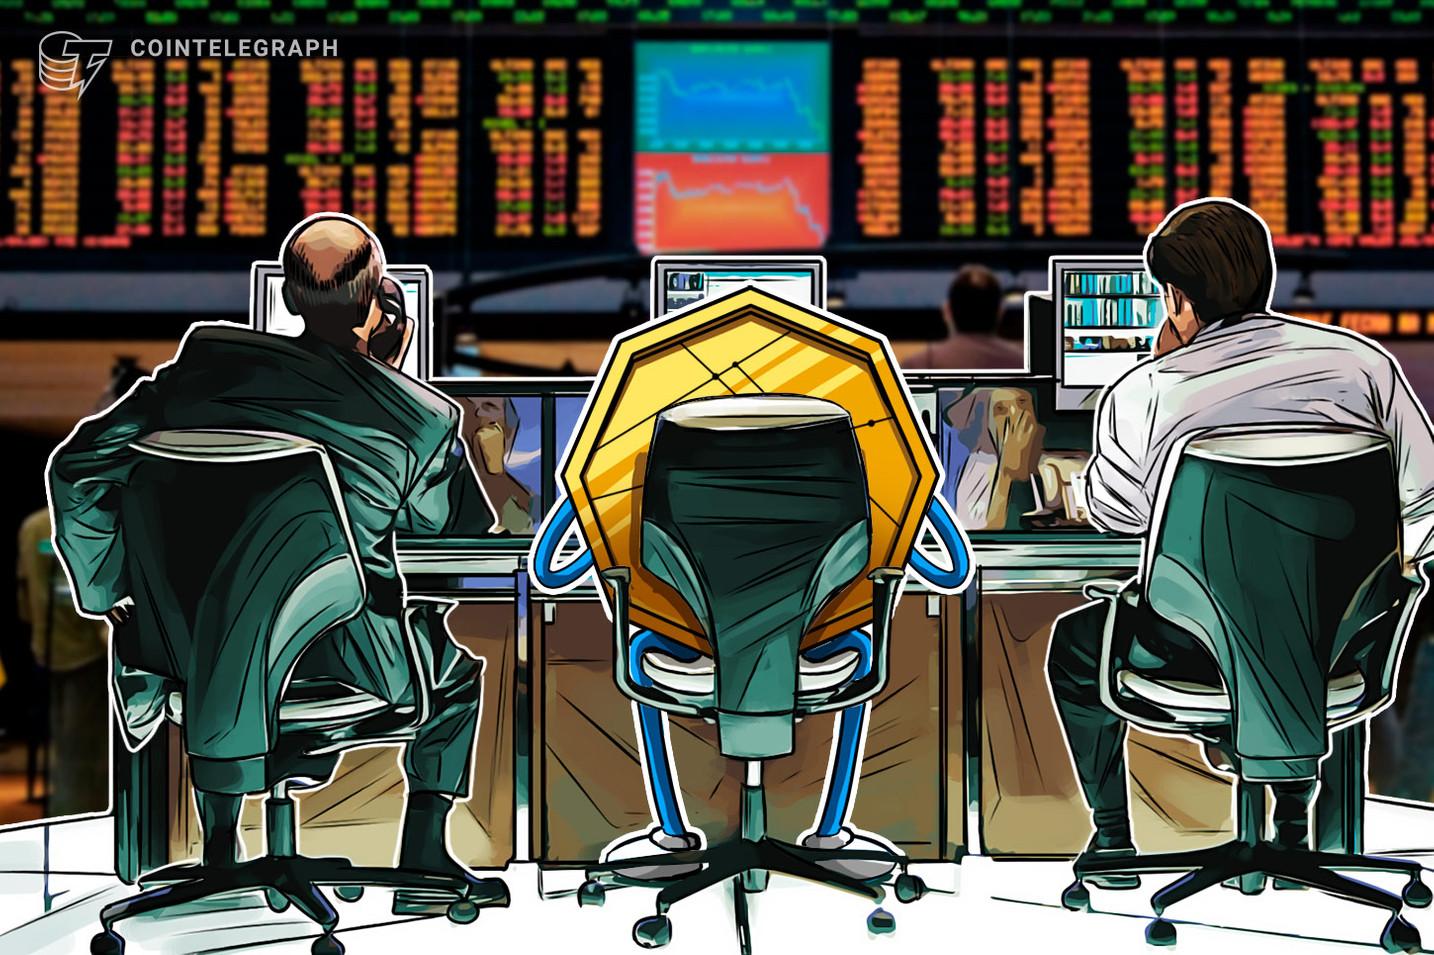 Coinbase (COIN) falls below $250, blockchain stocks sell off as Bitcoin dip continues